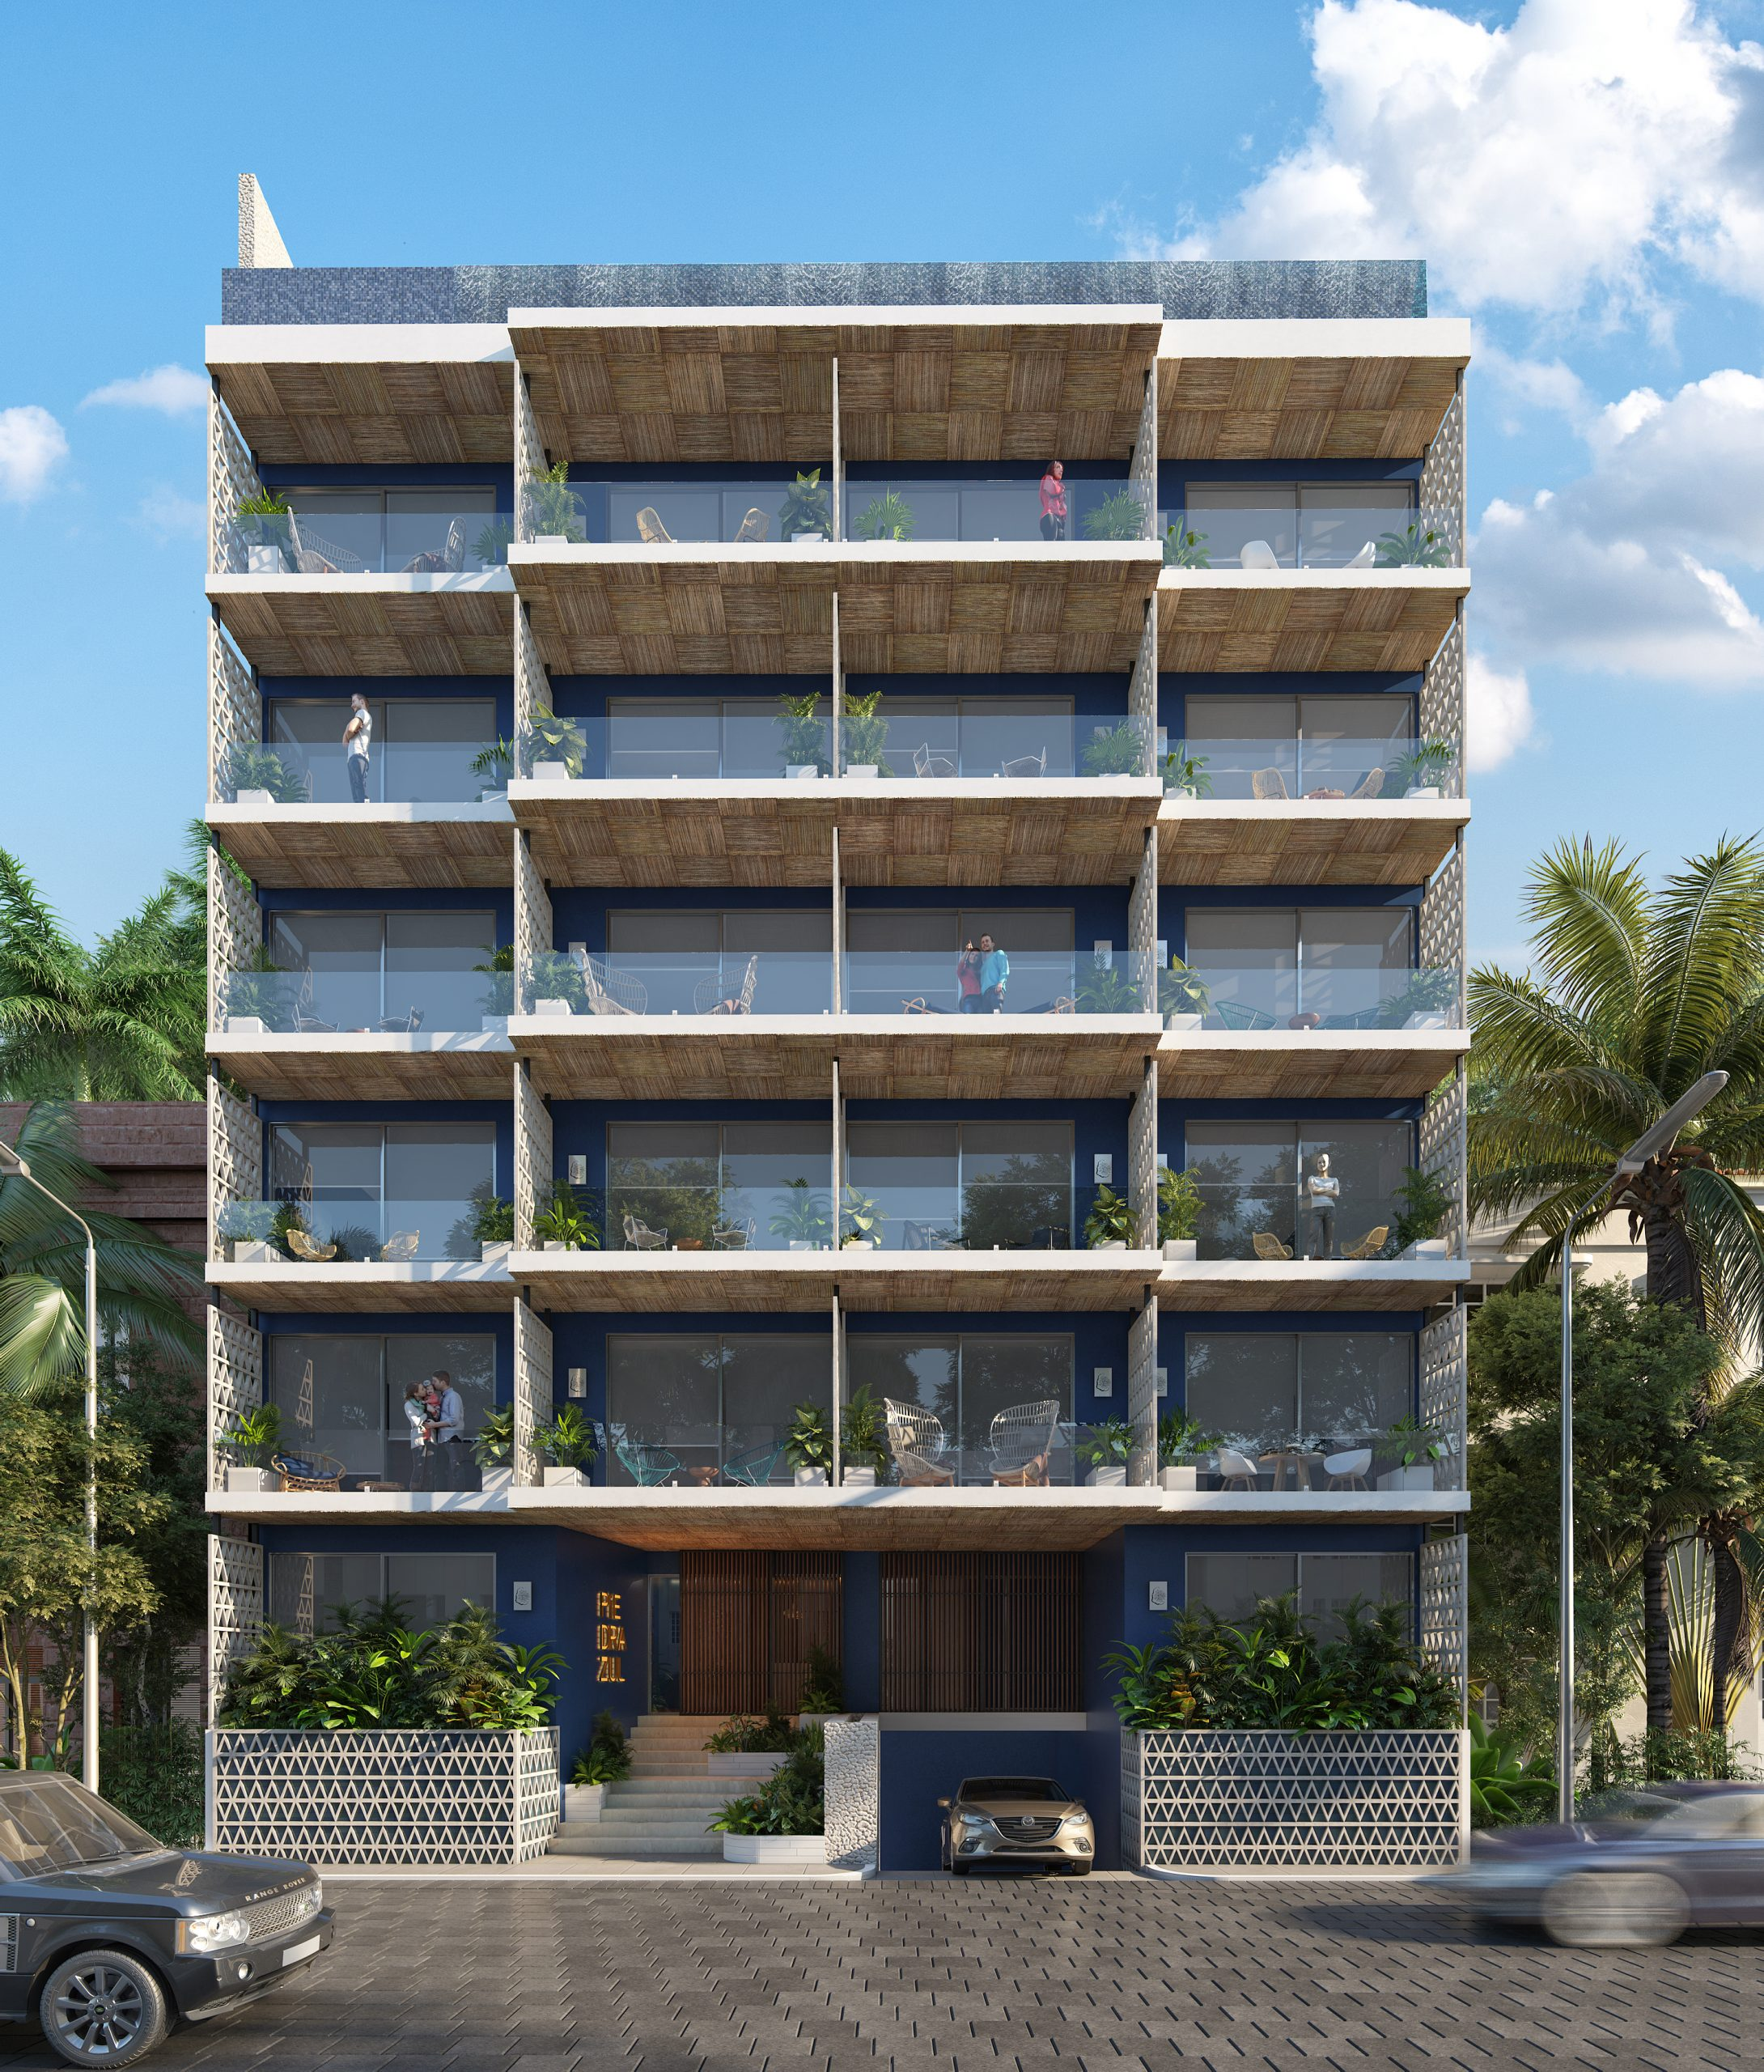 01 - FACHADA DIURNA - PIEDRAZUL- Pelicano Properties - Playa del Carmen